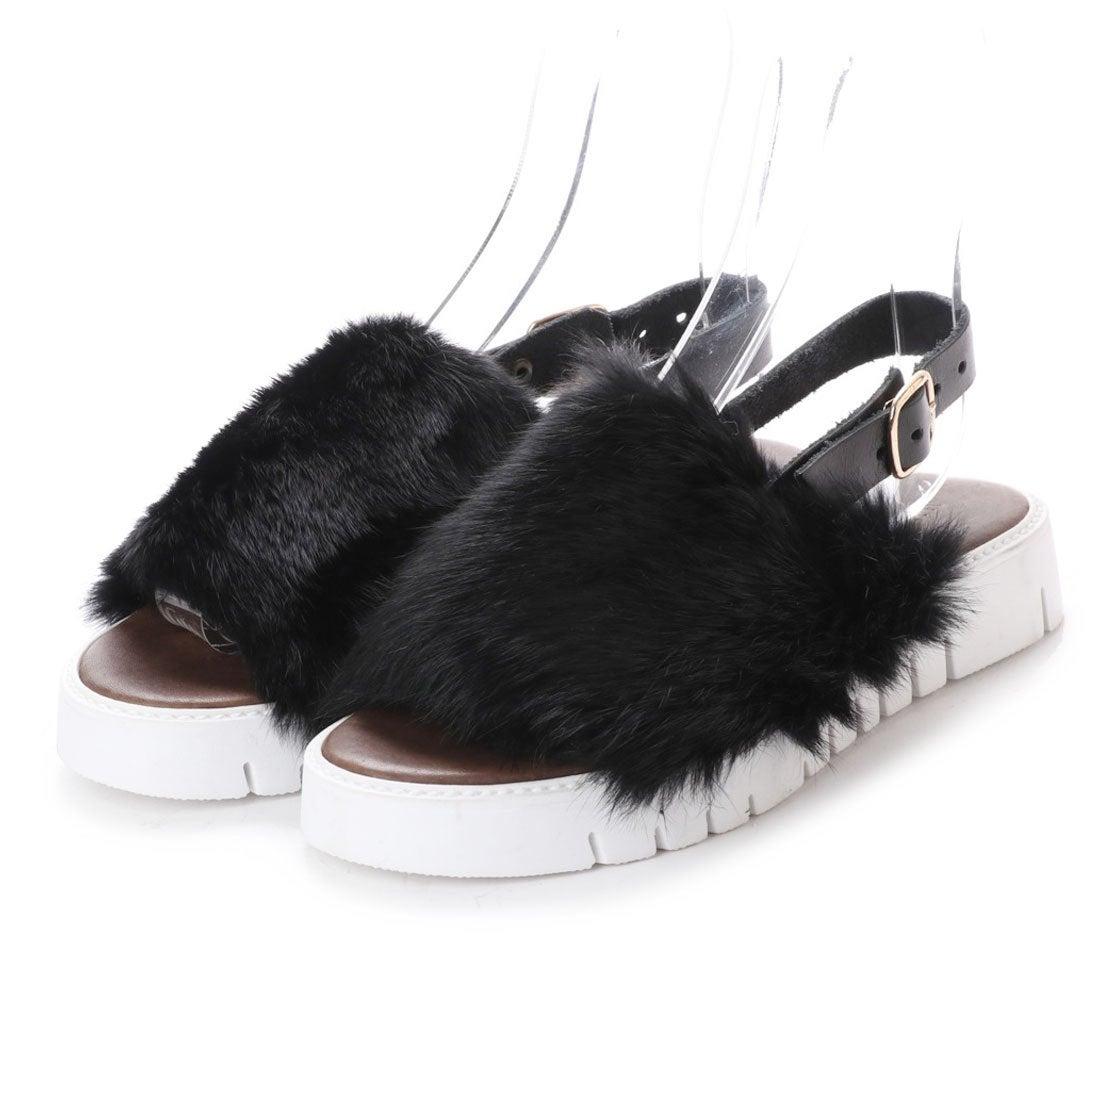 【SALE 70%OFF】ナンバートゥエンティワン NUMBER TWENTY-ONE 婦人靴 (BLUNERO) レディース